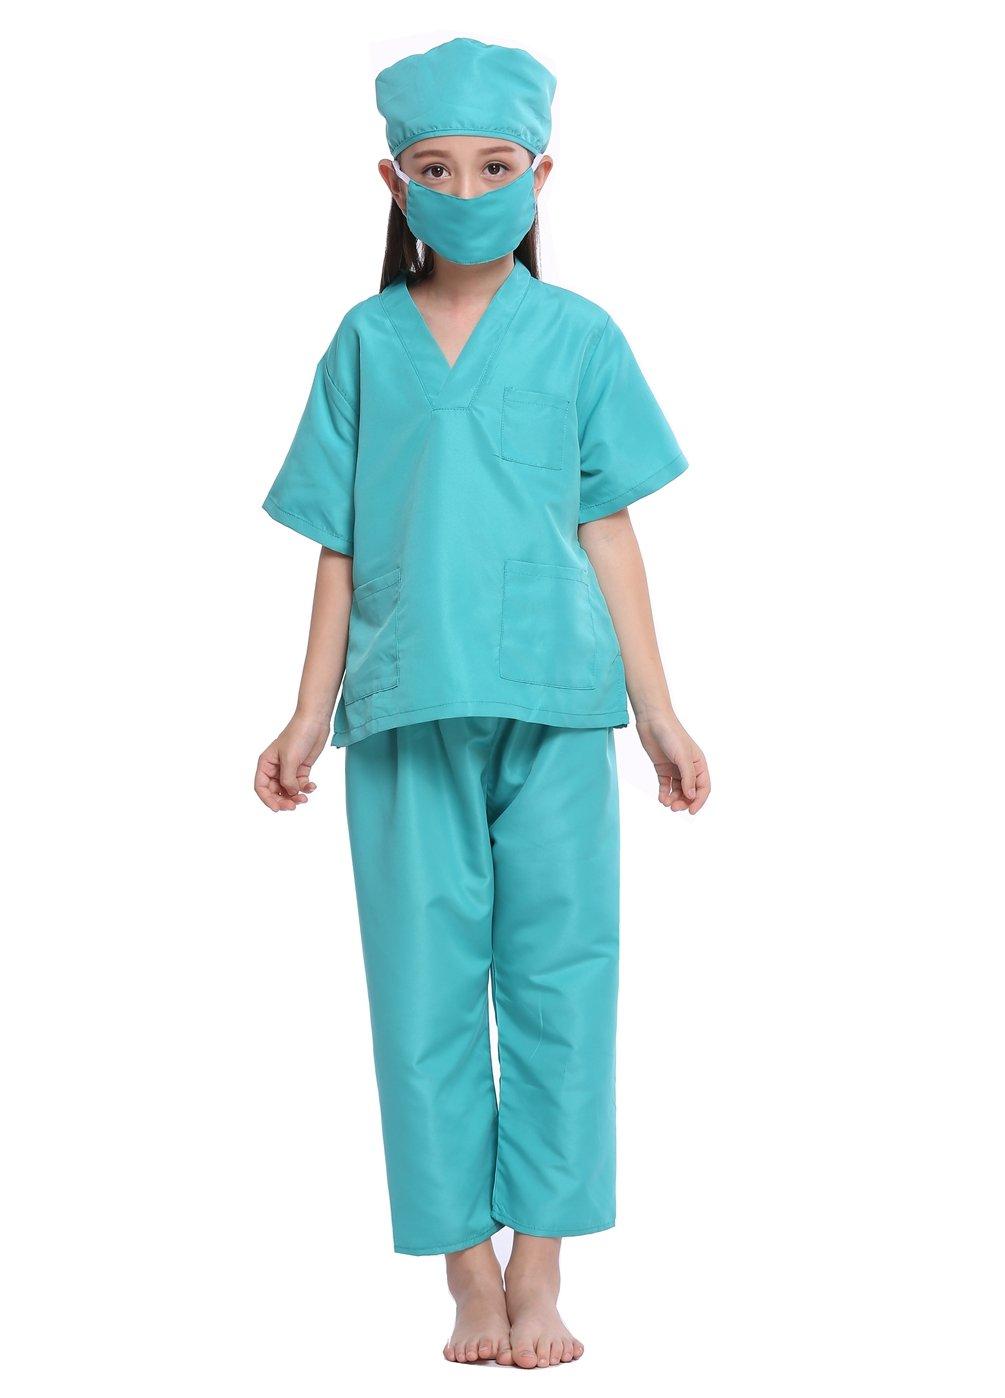 SamTaiker Kids Doctor Costumes, Children Toddler Nurse Doctor Role Play Costume Dress-Up Uniform Scrubs Set For Boys Girls (Surgical Green, 6-8)